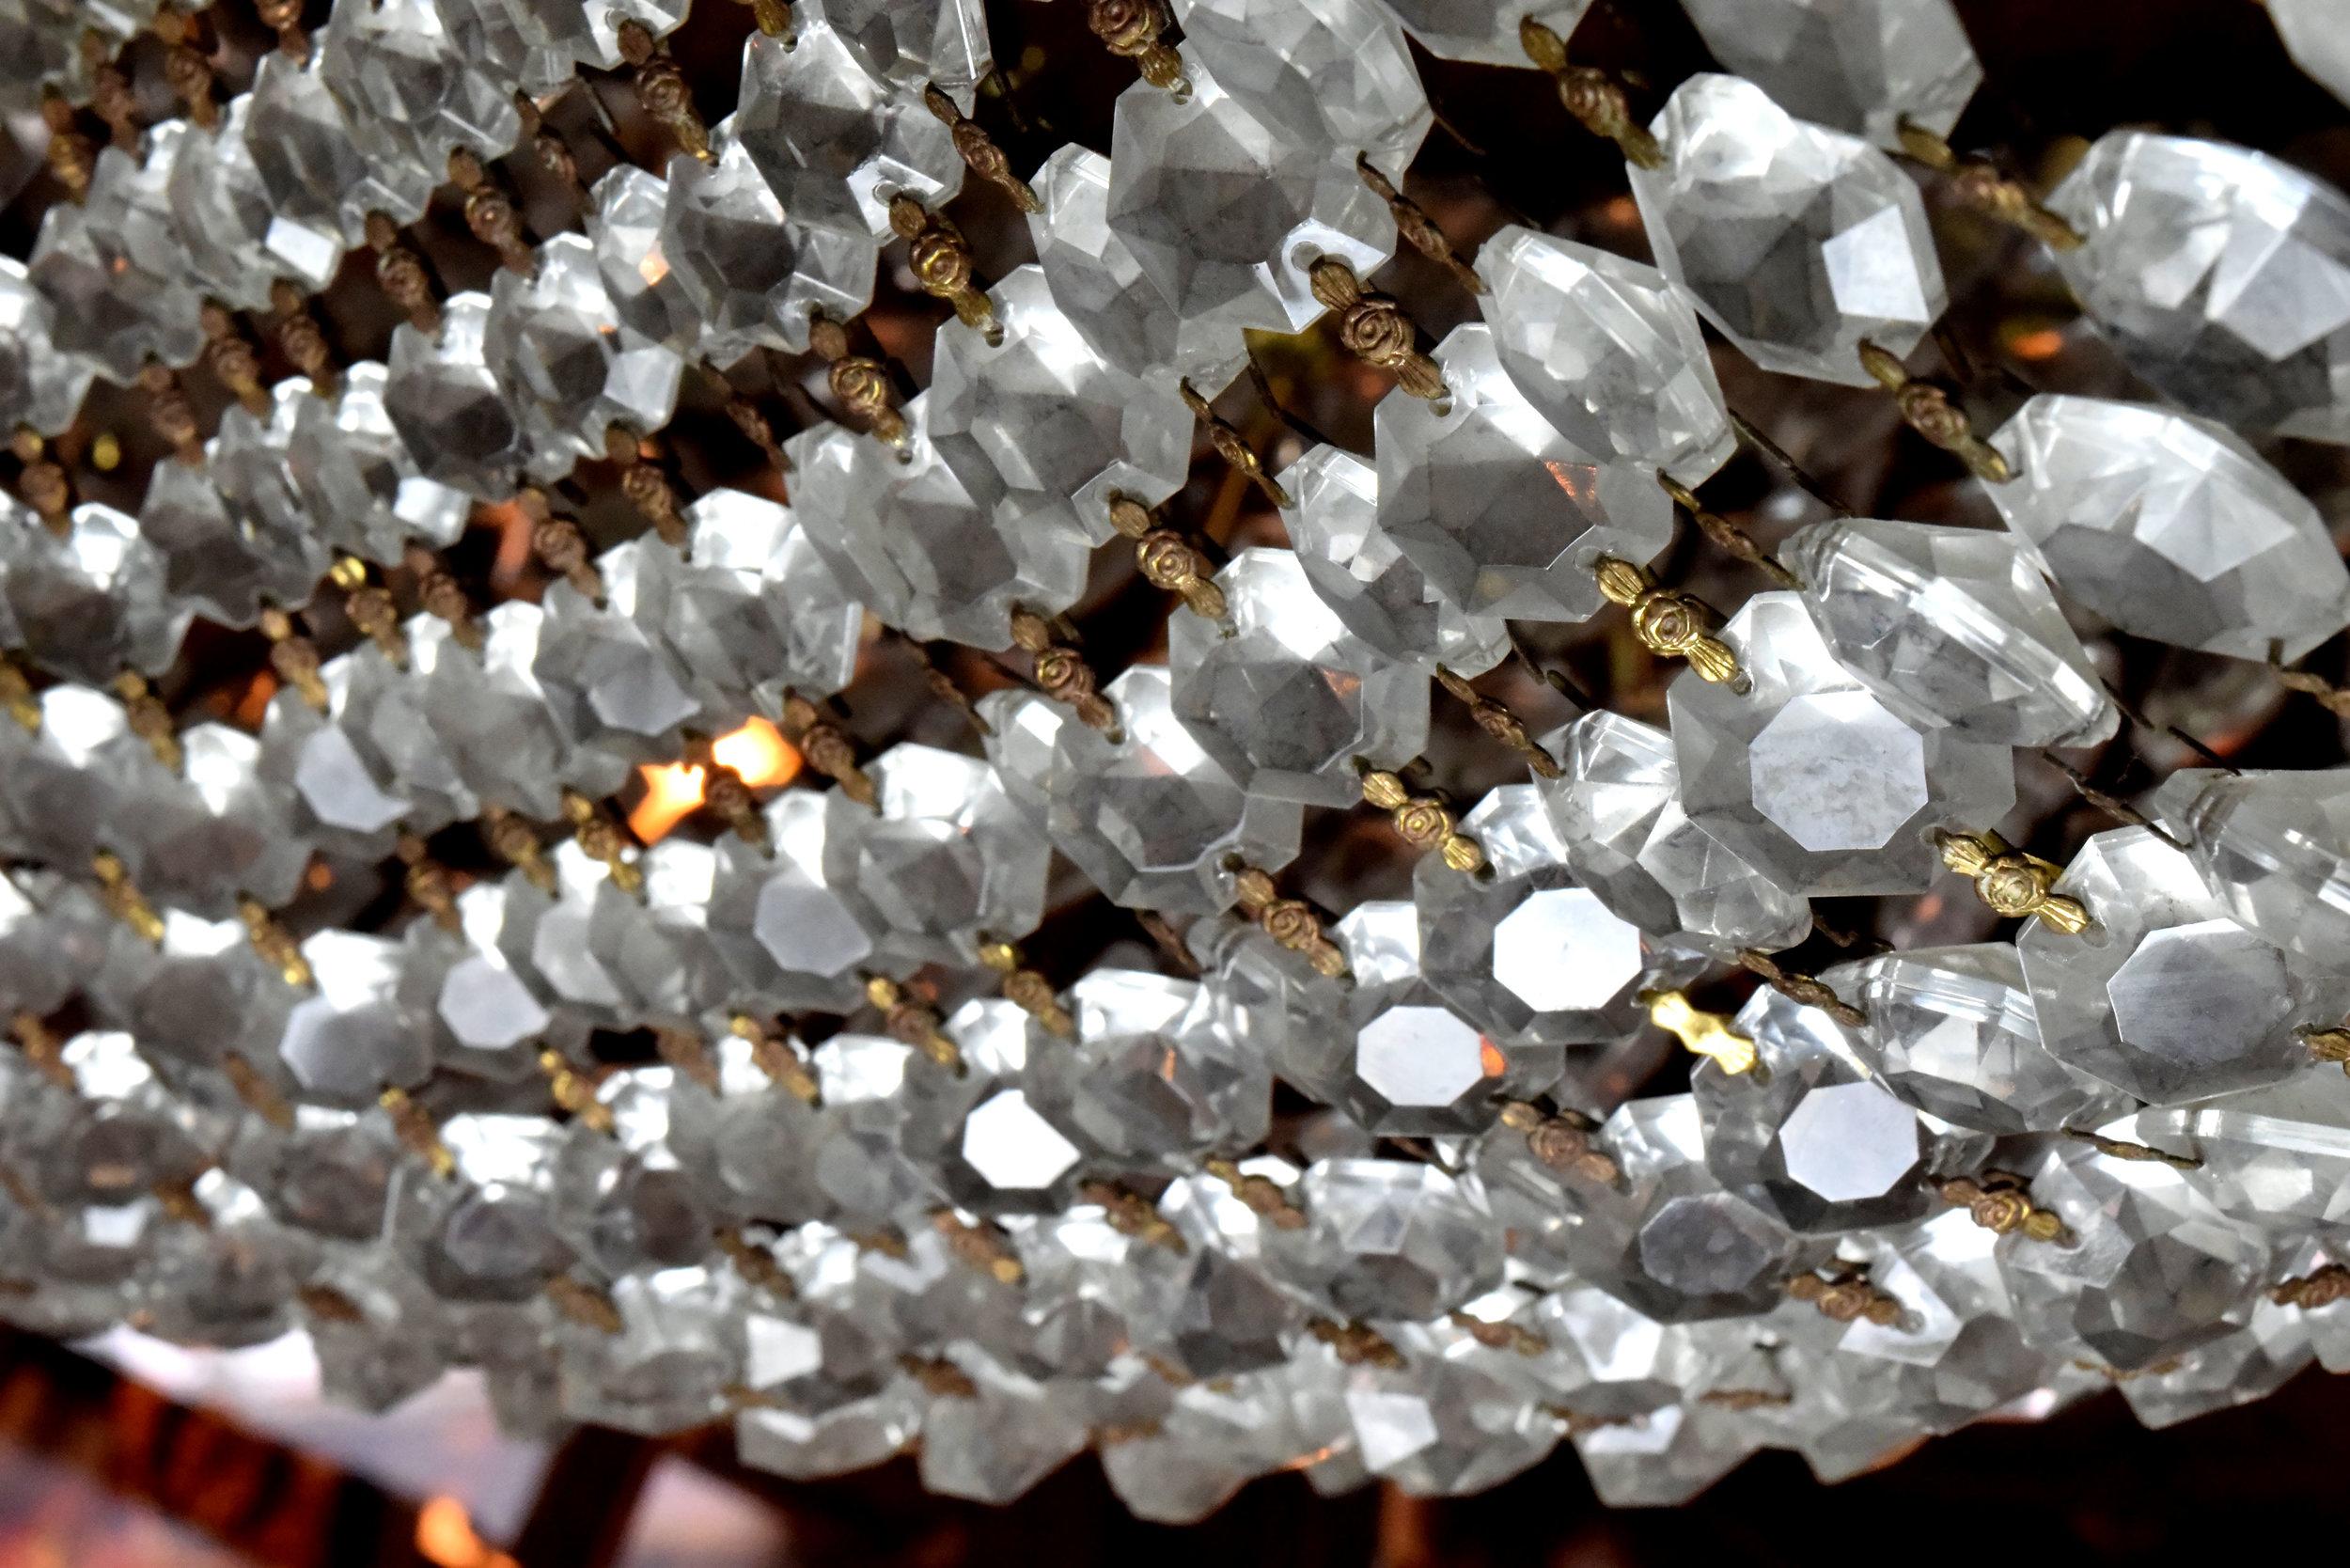 47206-italian-crystal-chandelier-multiple-crystals-detail.jpg